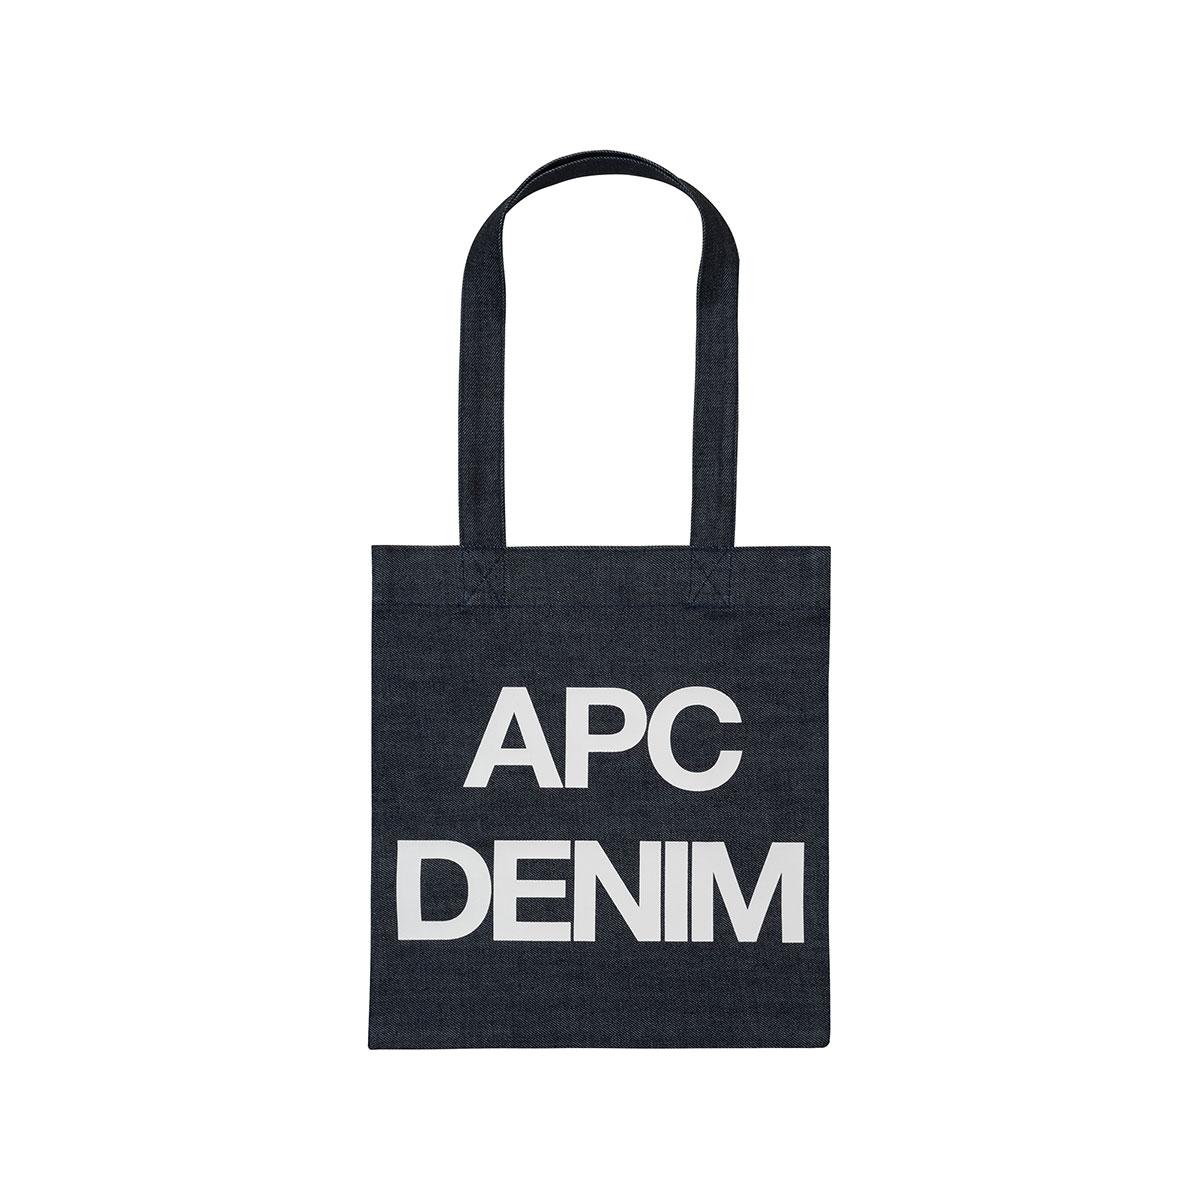 A.P.C. / TOTE BAG APC DENIM -WHITE